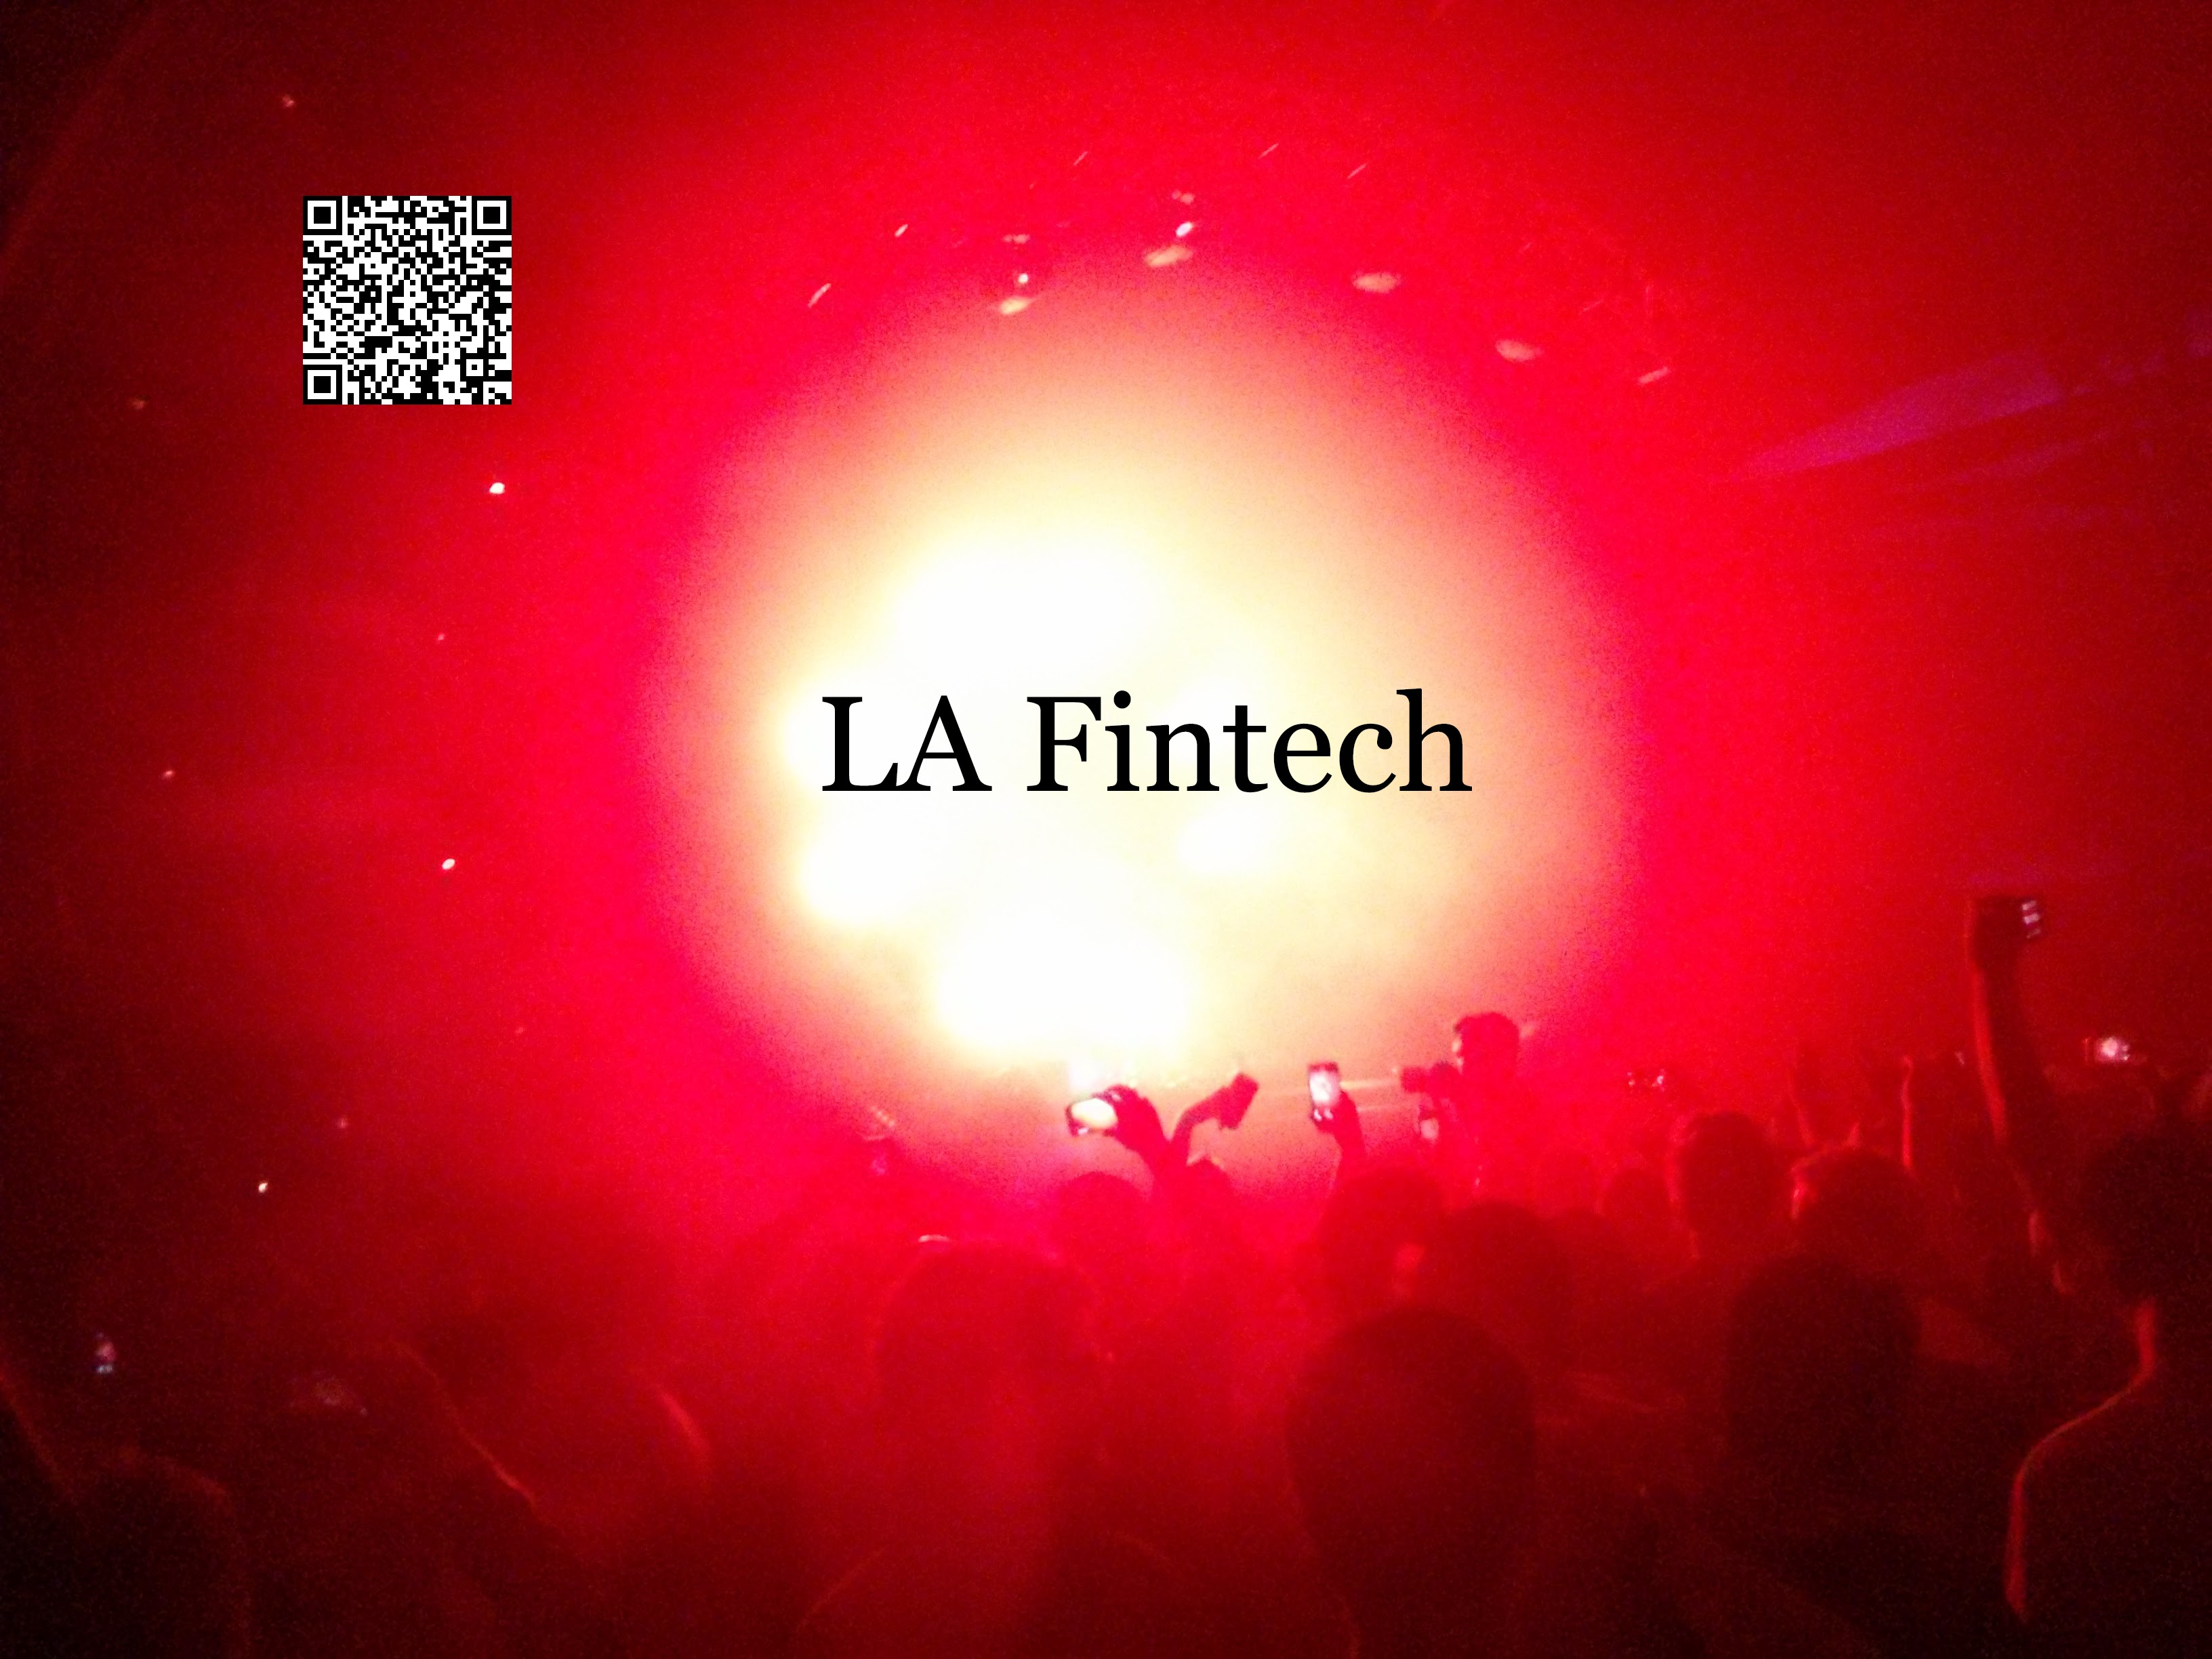 LA Fintech Mix Mingle Network